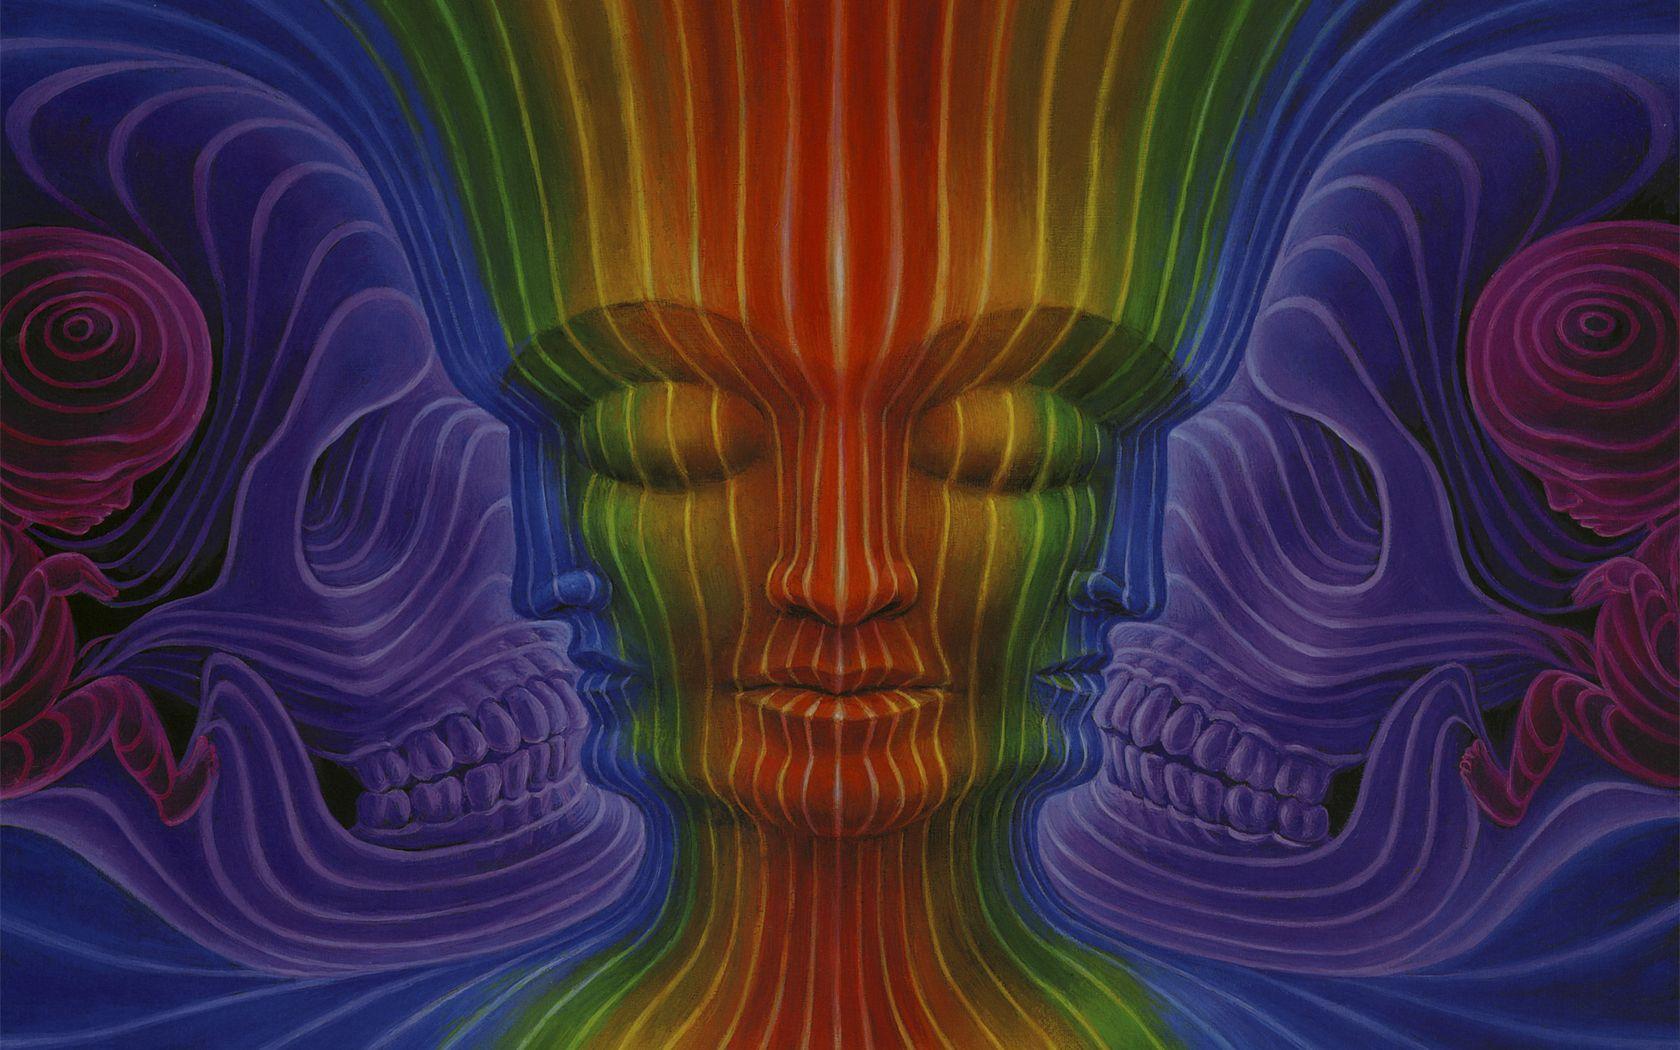 Phone Wallpaper Hd Alex Gray Art Psychedelic Poster Digital Wallpaper